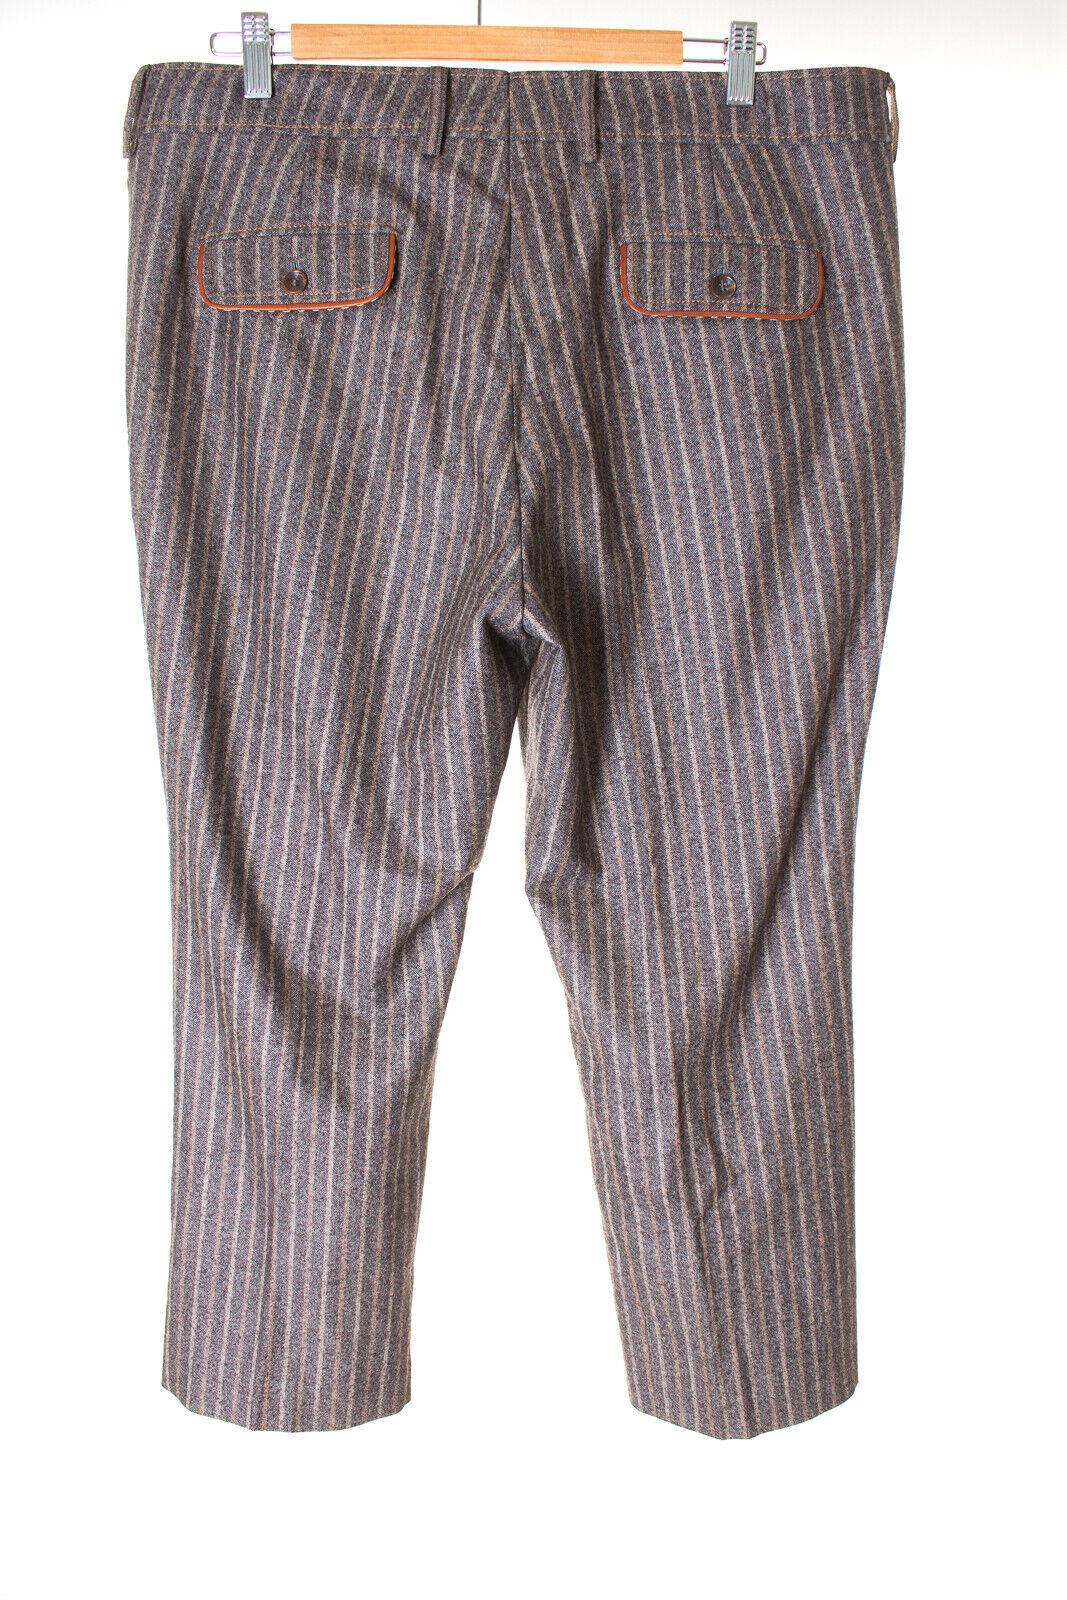 Bogner Pantaloni 3 4 trousers trousers trousers LANA PELLE DONNA TG. de 44 (US 14 Long) Multicolore 350b01